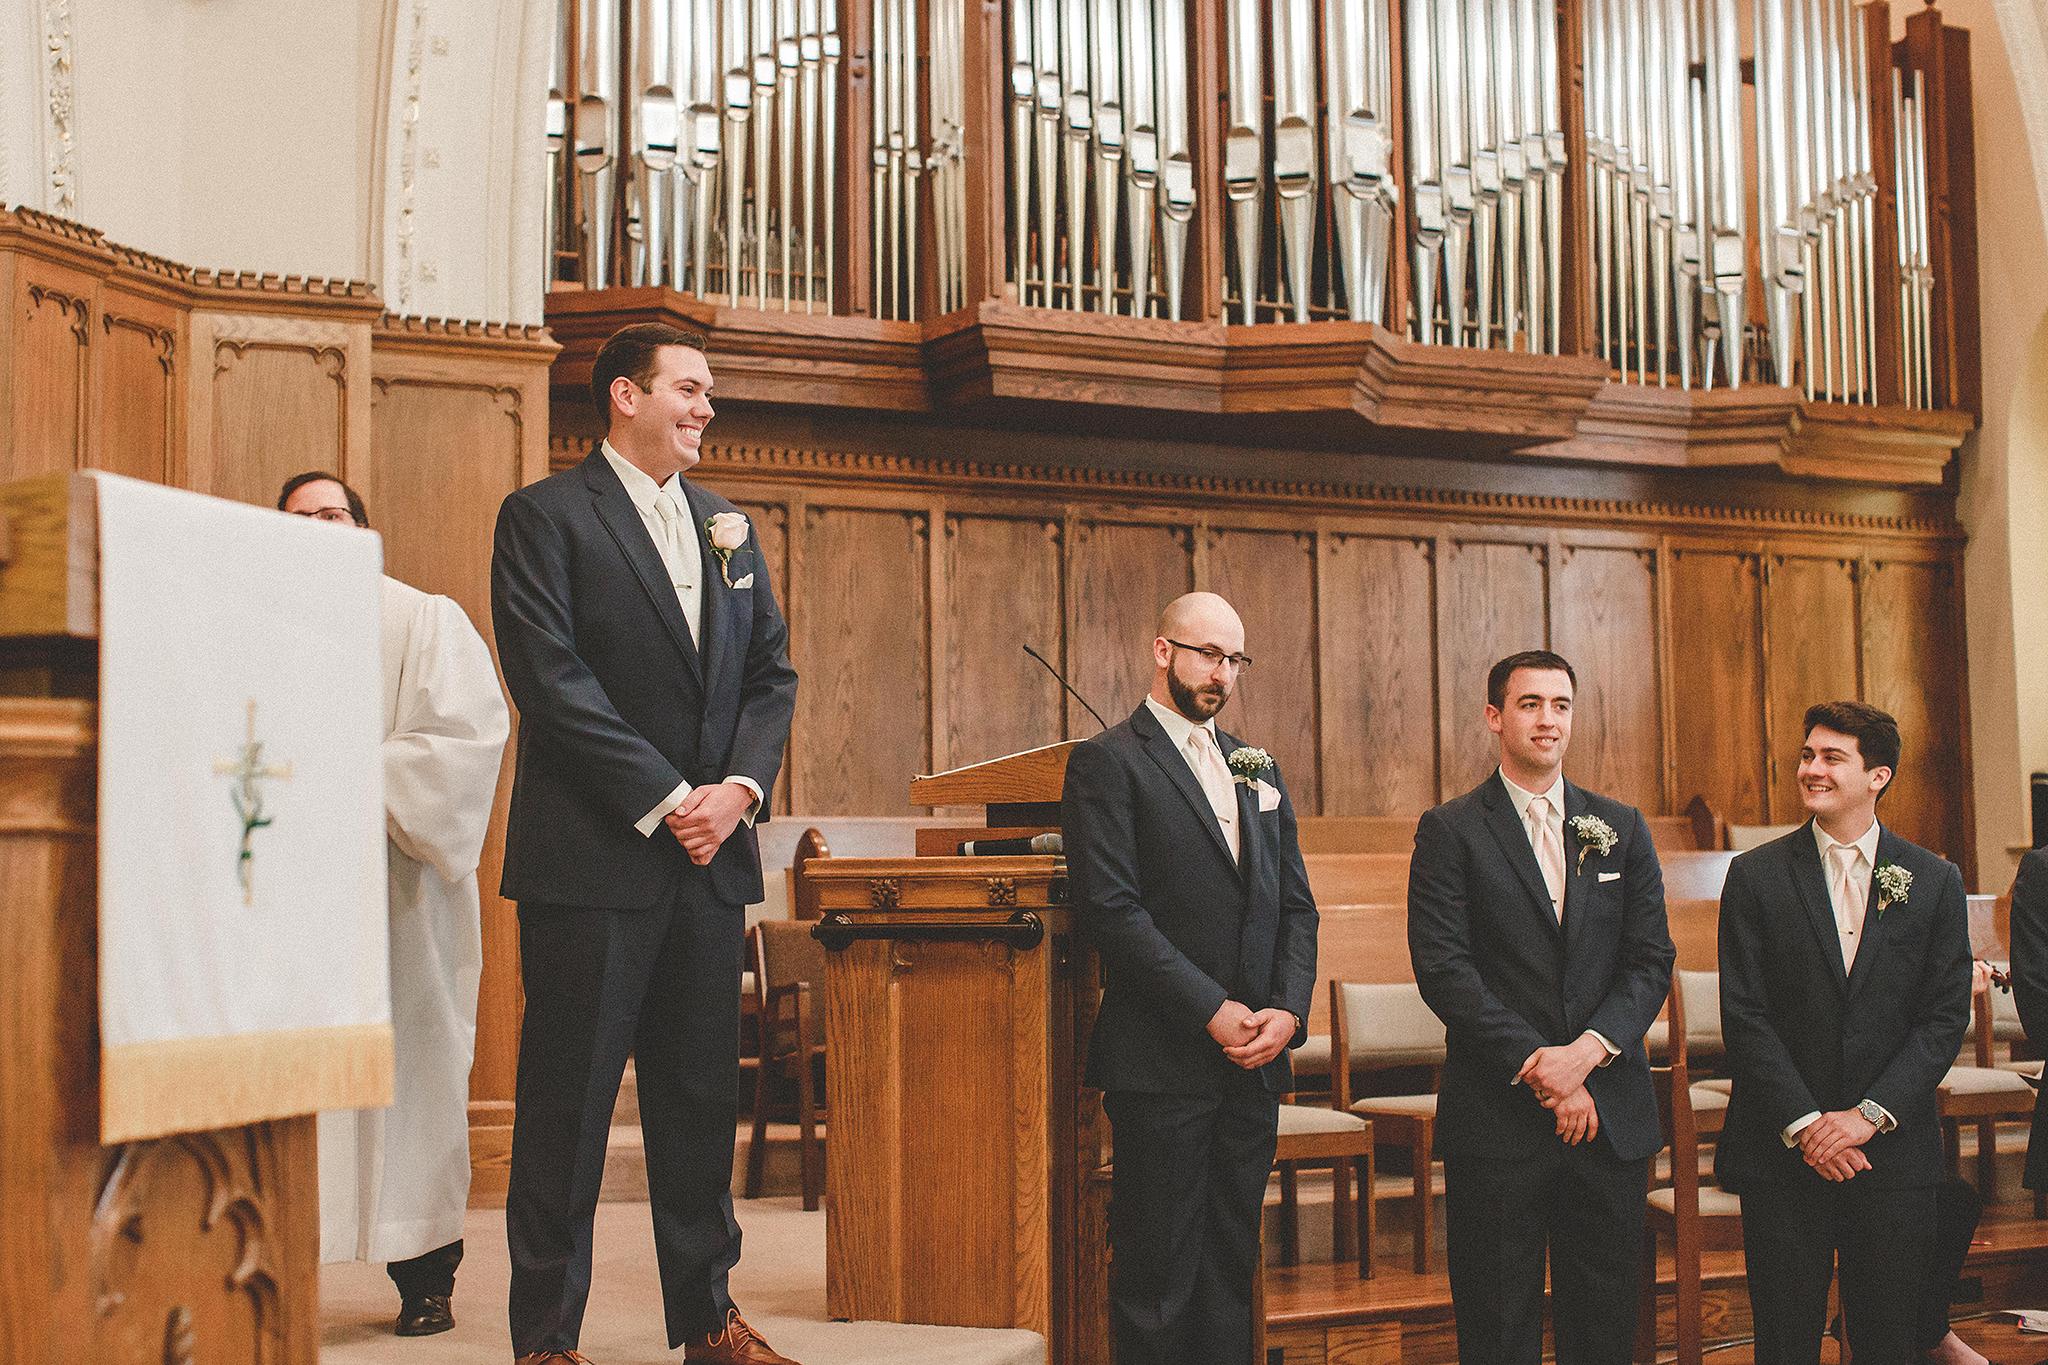 wedding ceremony at first united methodist church | dekalb, il wedding photographer